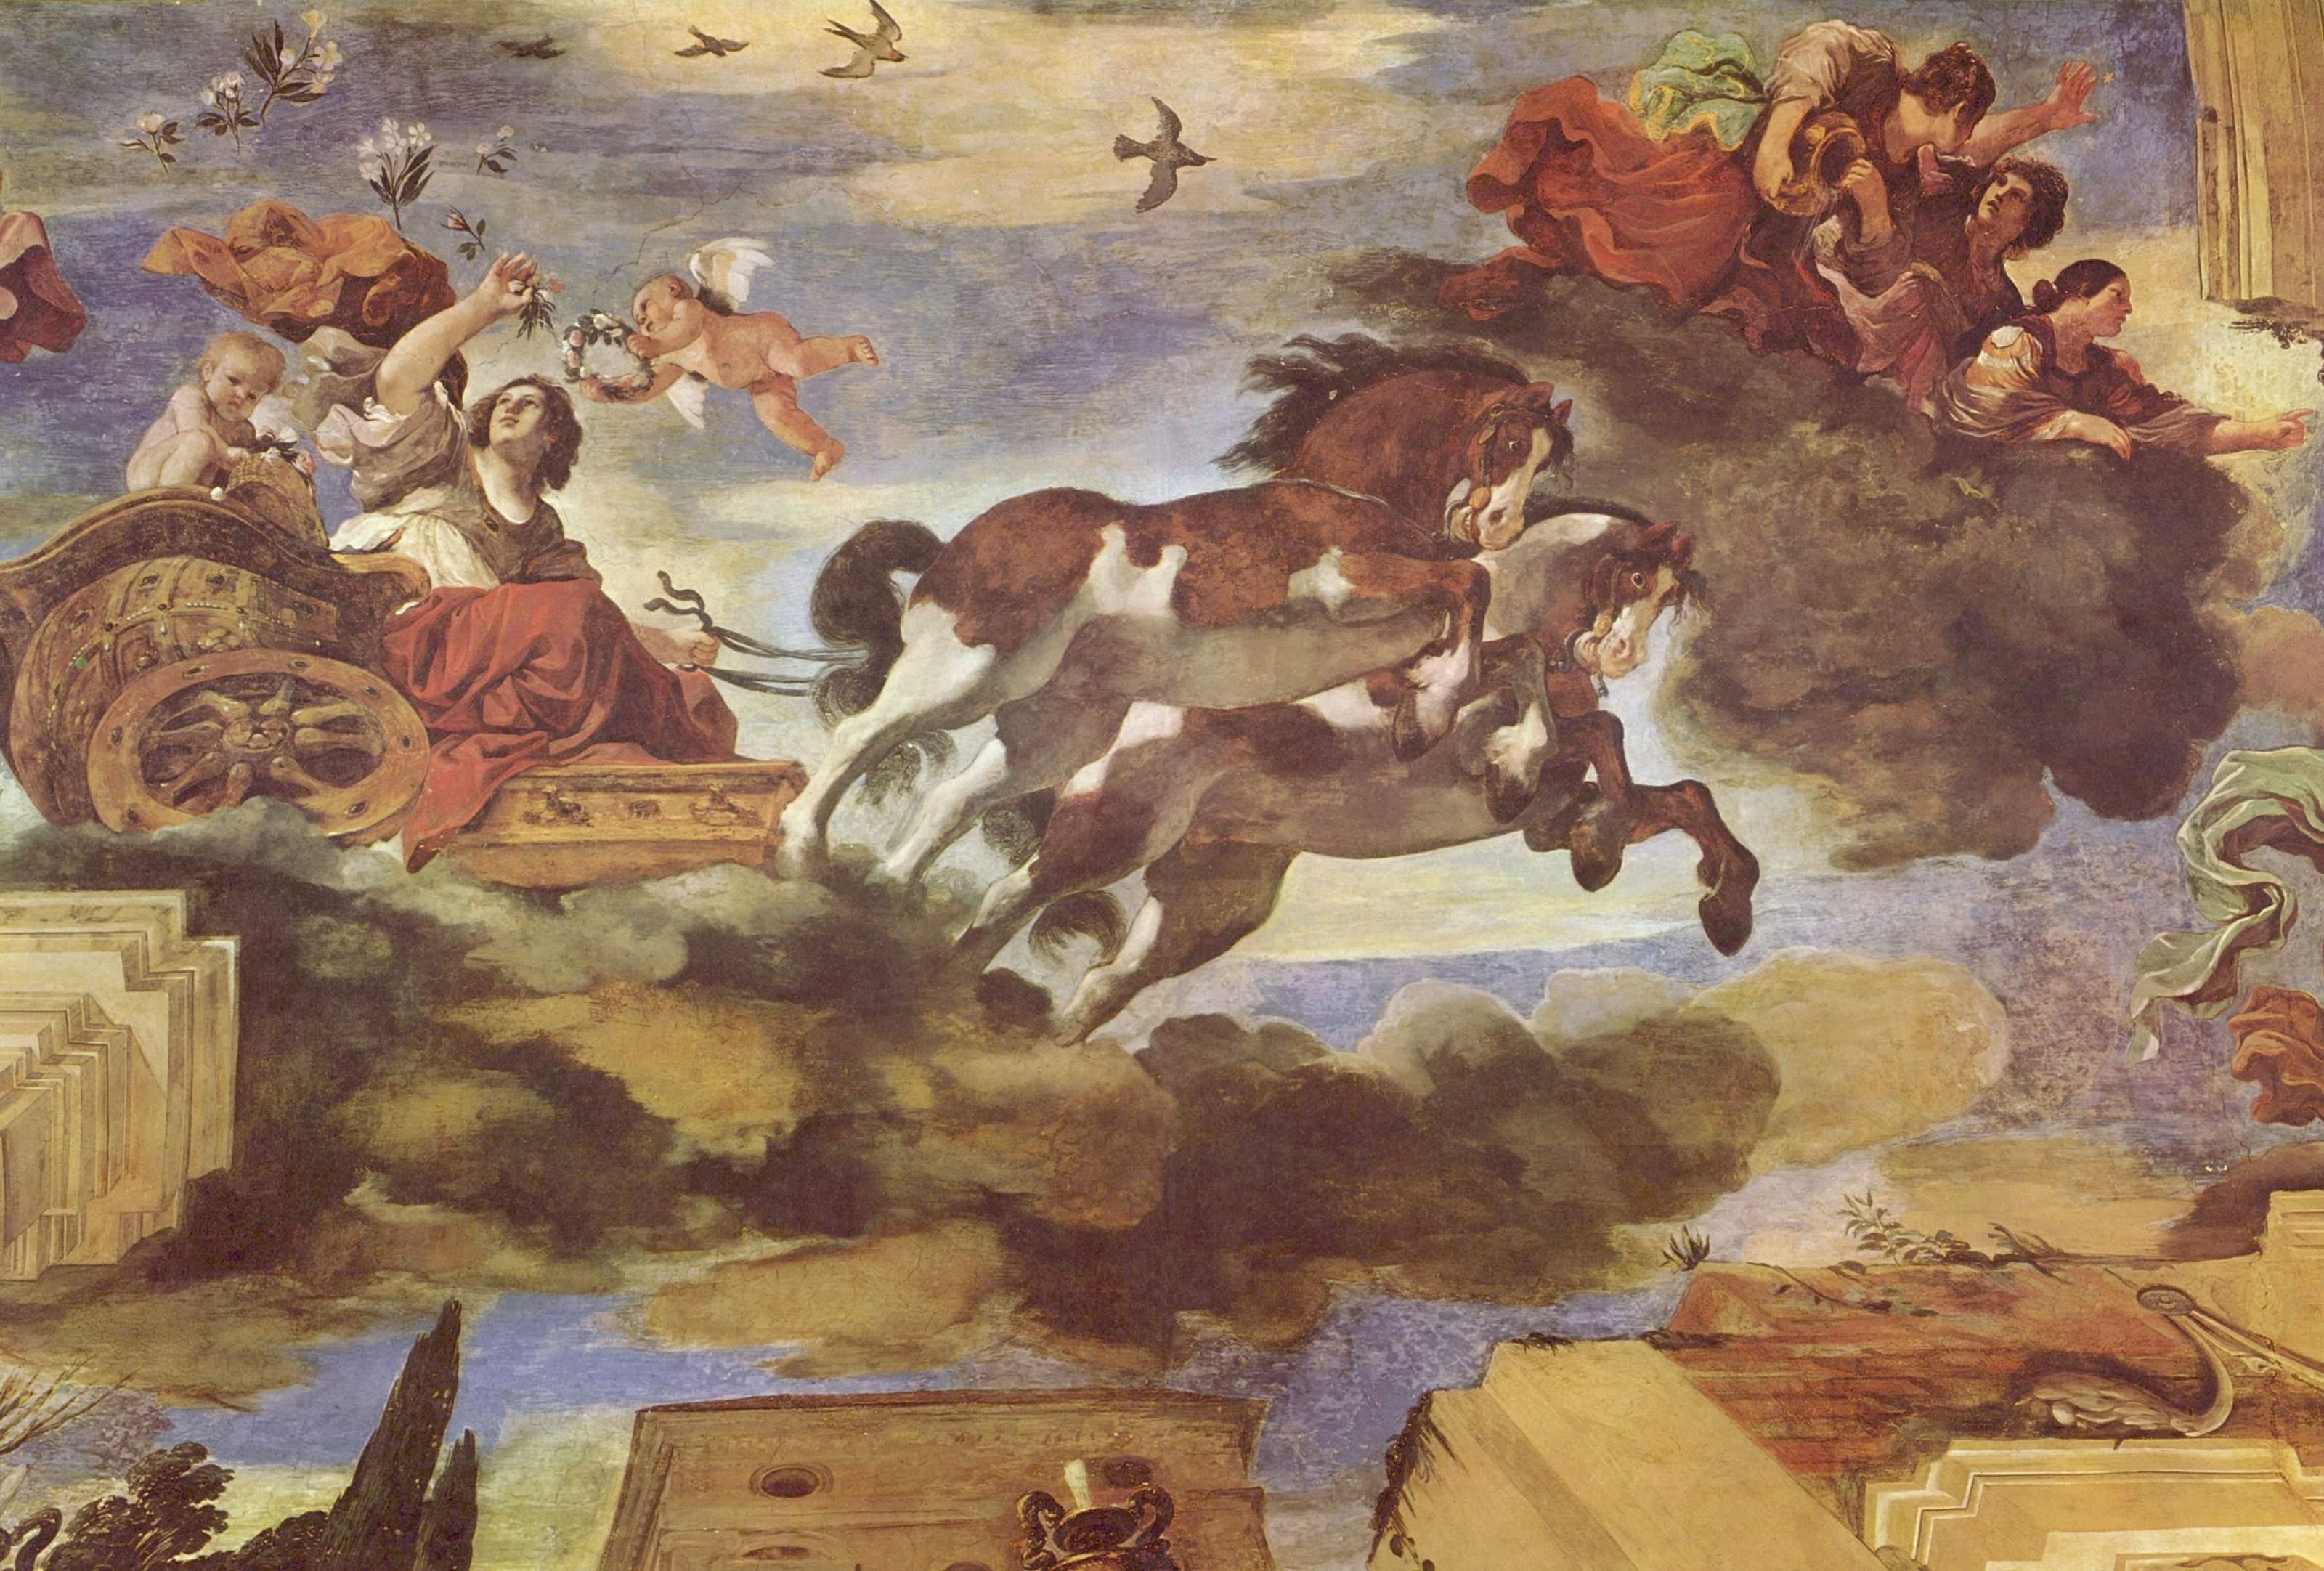 Secretos de argos marzo 2007 for Define mural art